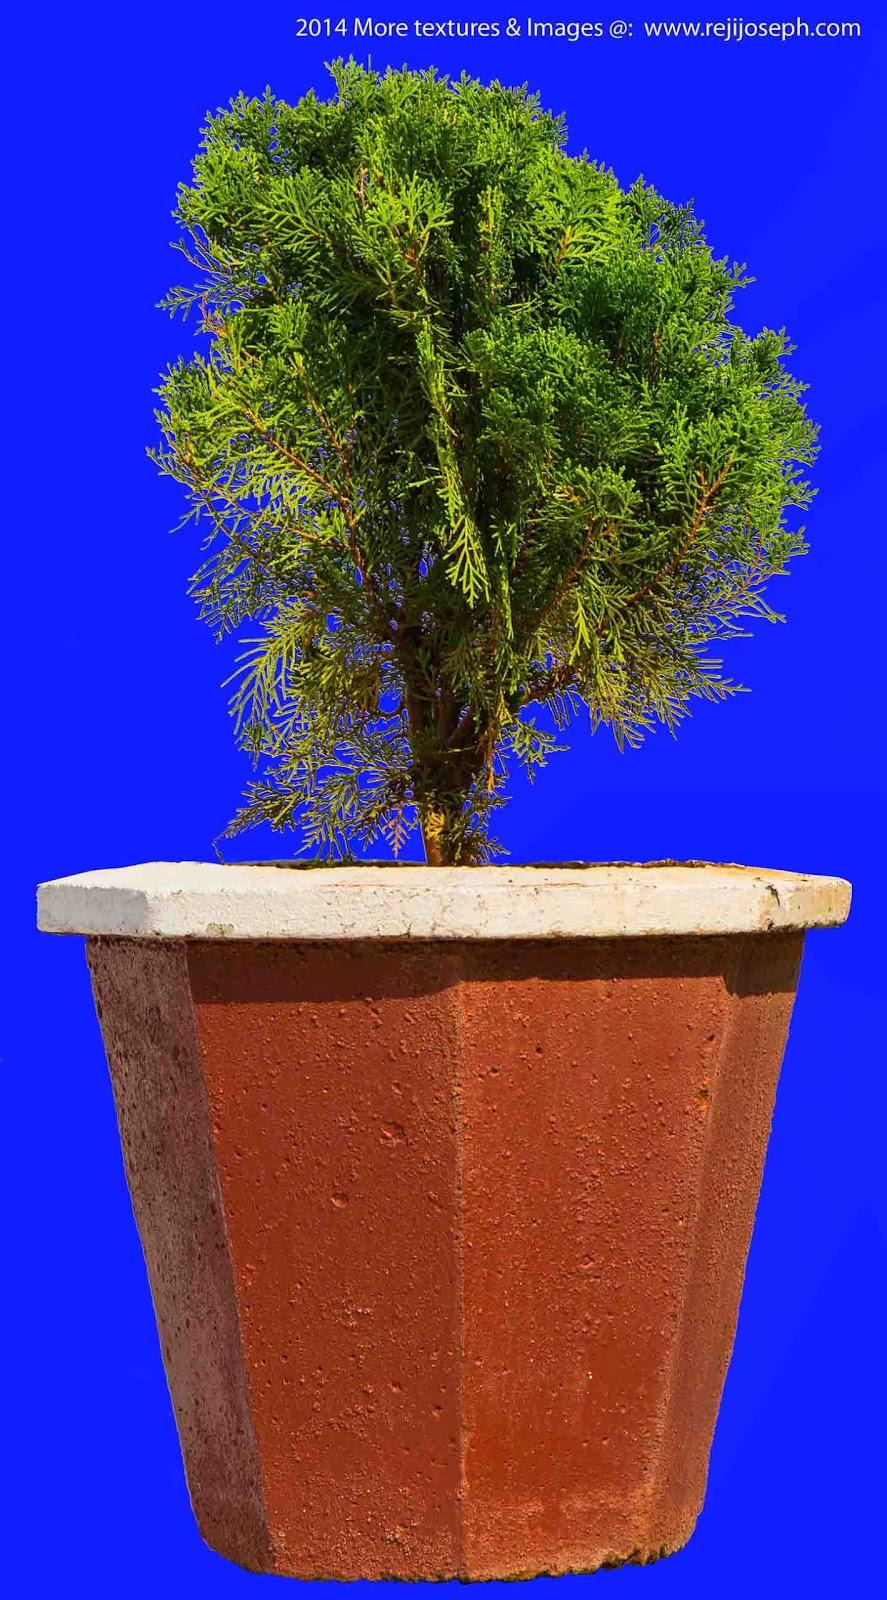 Cypress Garden Plant Texture 00001